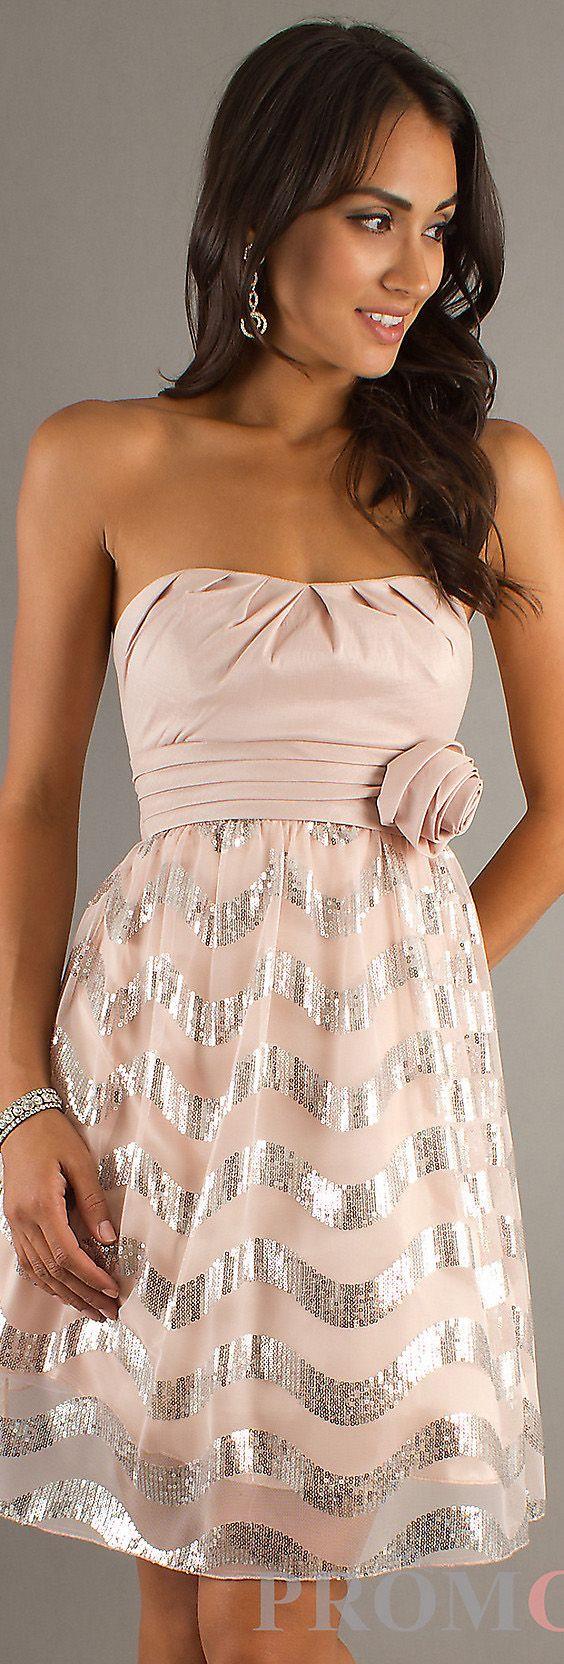 Mini dress strapless chic cocktail dresses party dresses